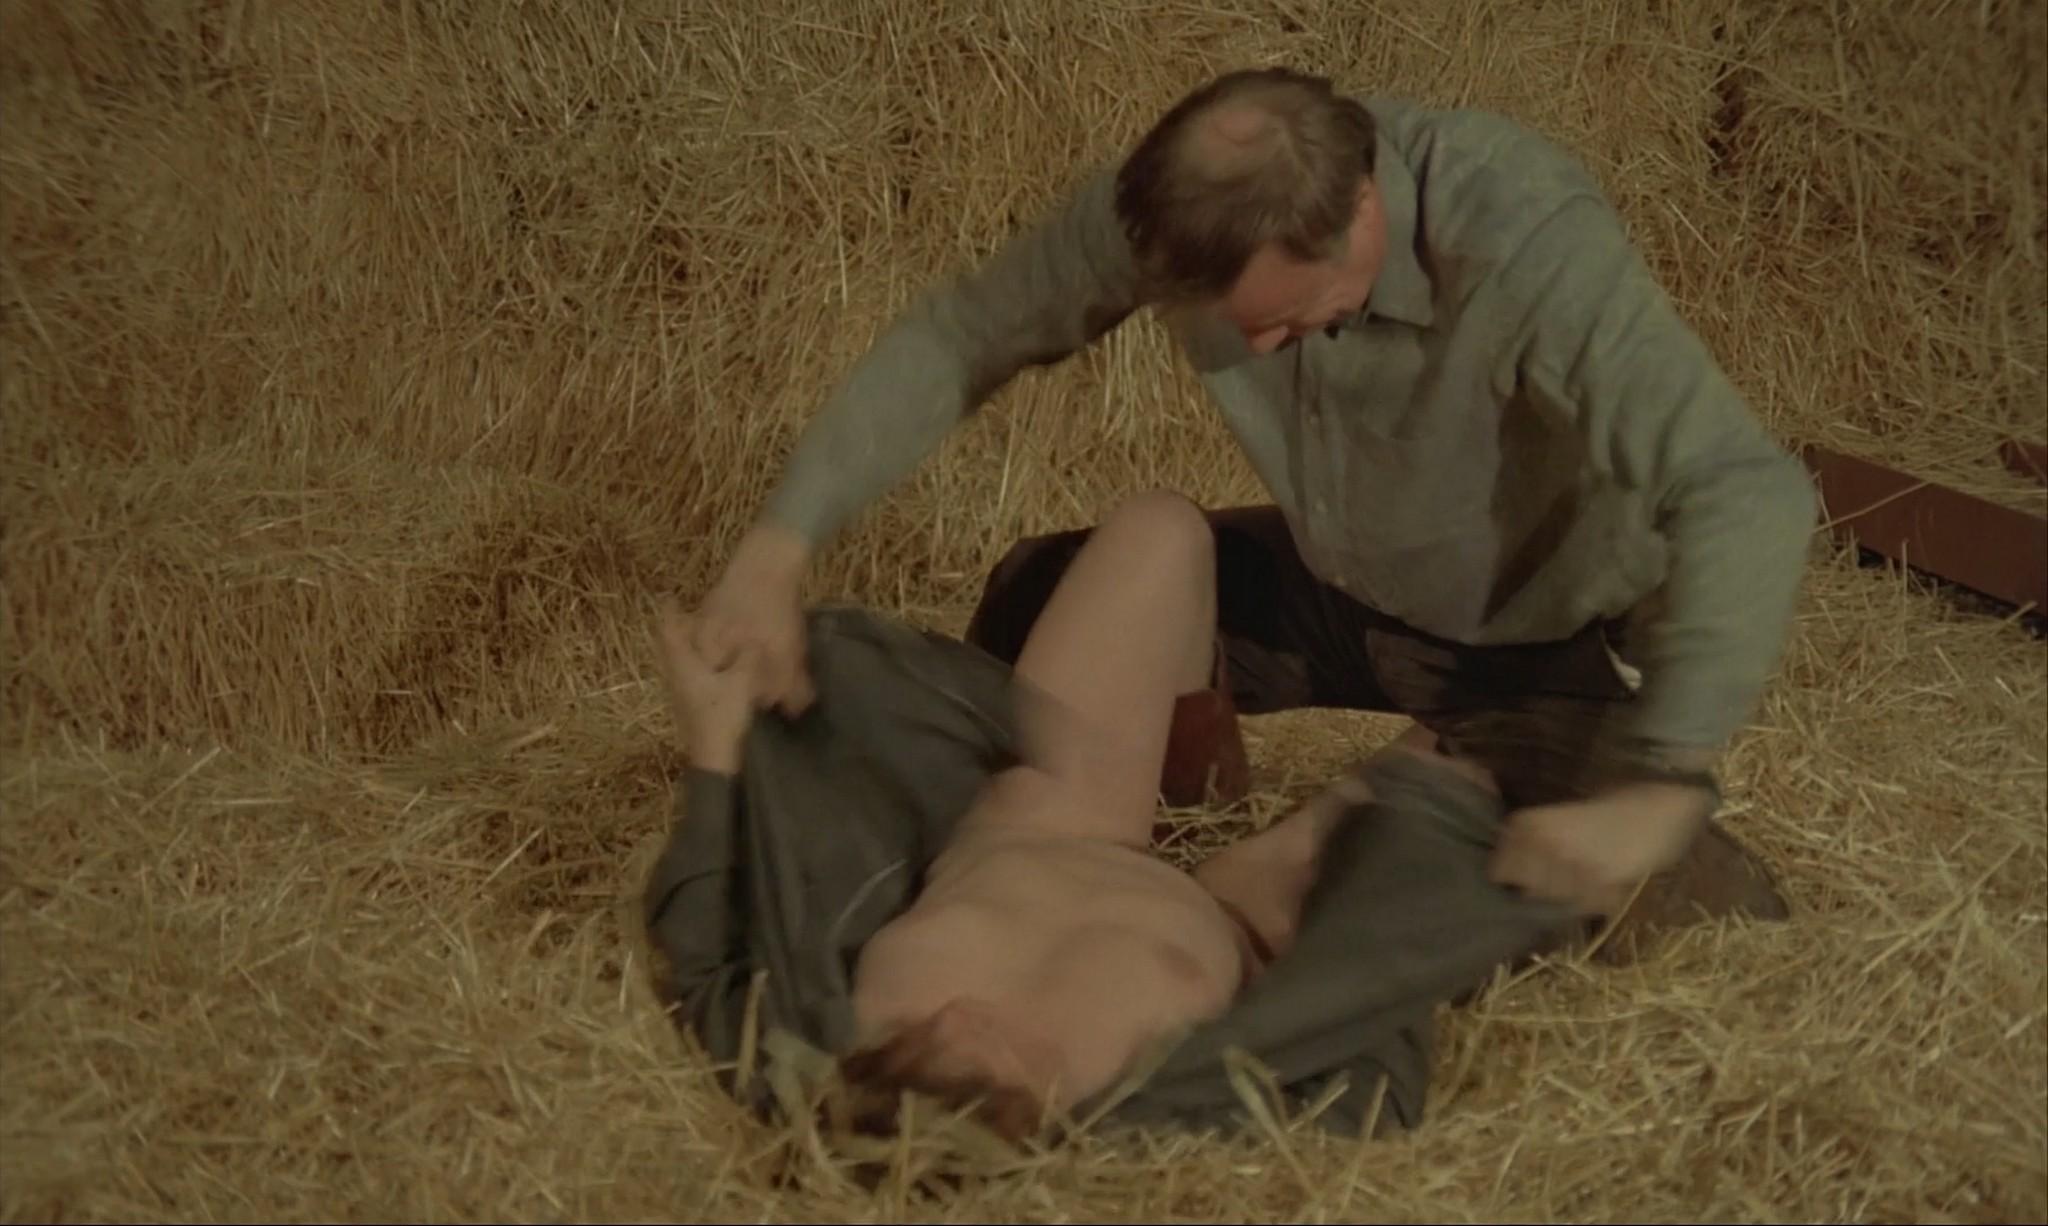 Malisa Longo nude full frontal Patrizia Gori and others nude too Helga la louve de Stilberg 1978 1080p BluRay 6